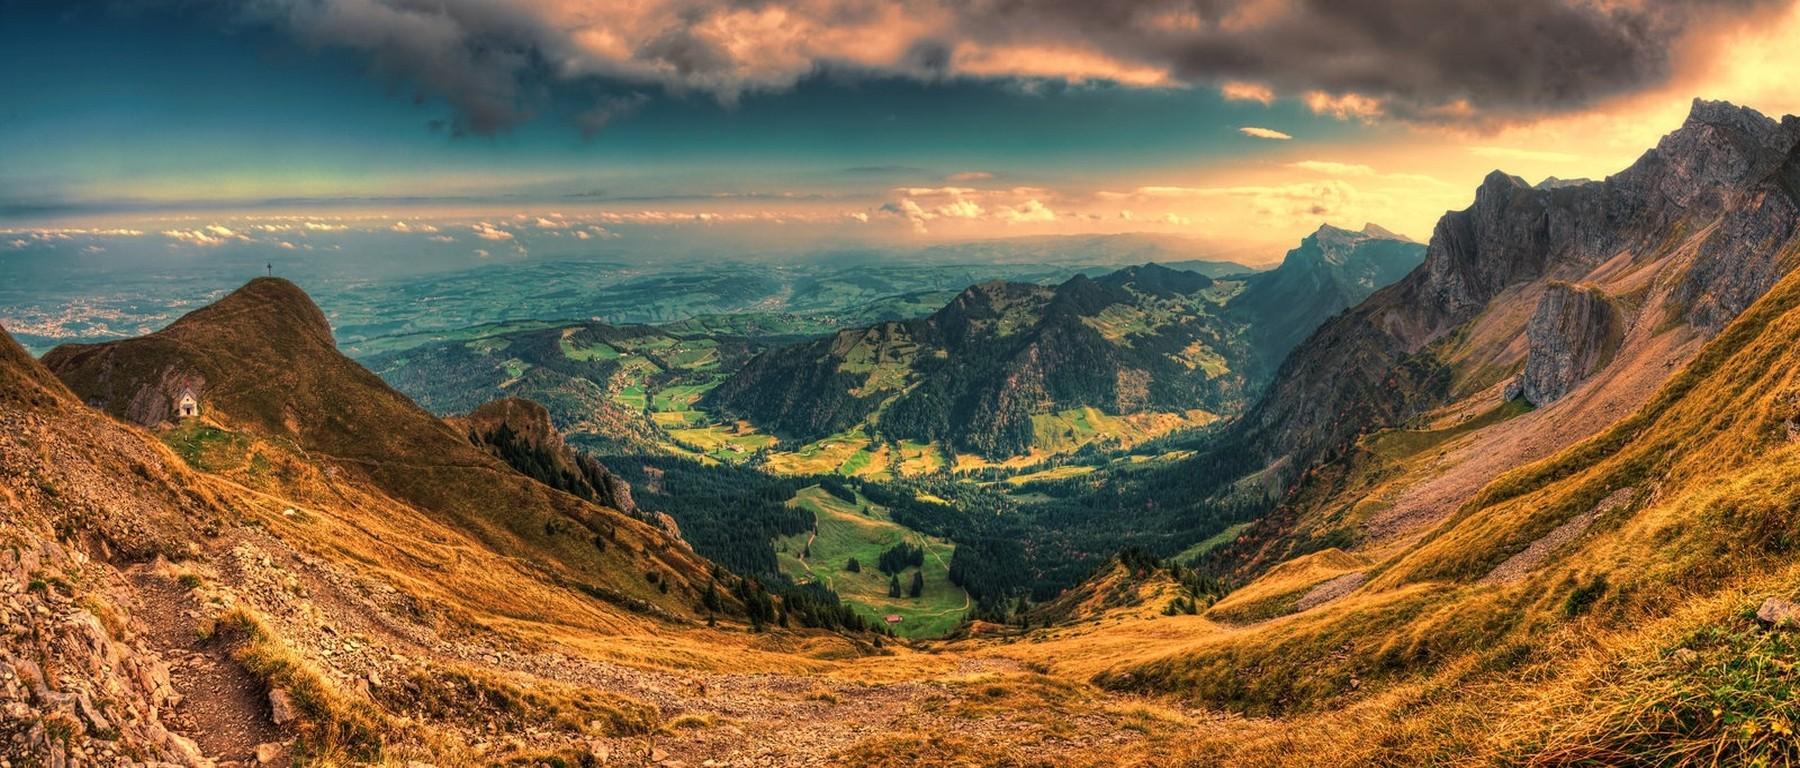 sunset Valley Panoramas Switzerland Nature Mountain Clouds 1800x768